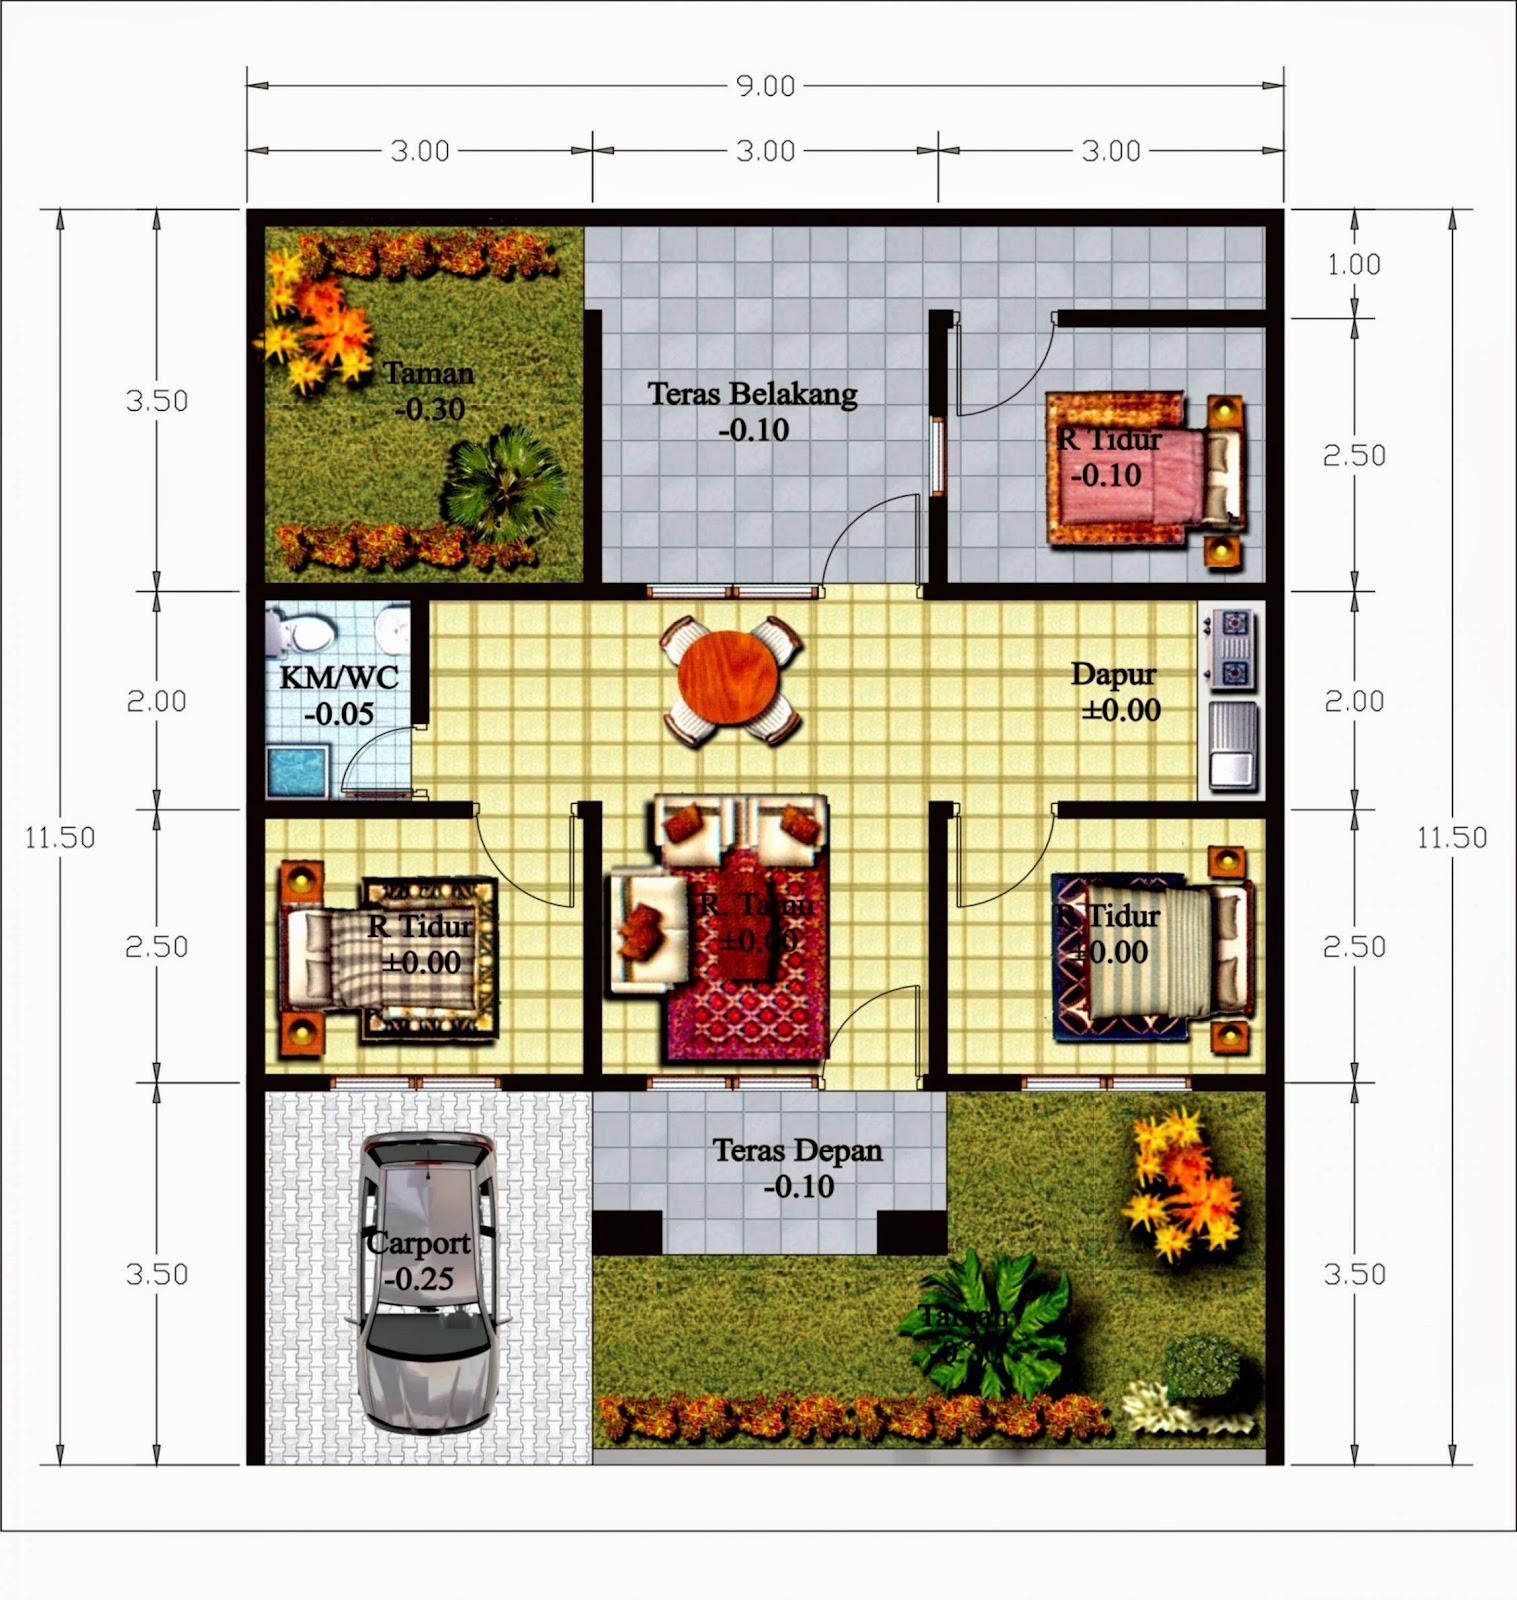 3 Contoh Denah Rumah Minimalis Modern Terbaru: Gambar Denah Rumah Terbaru